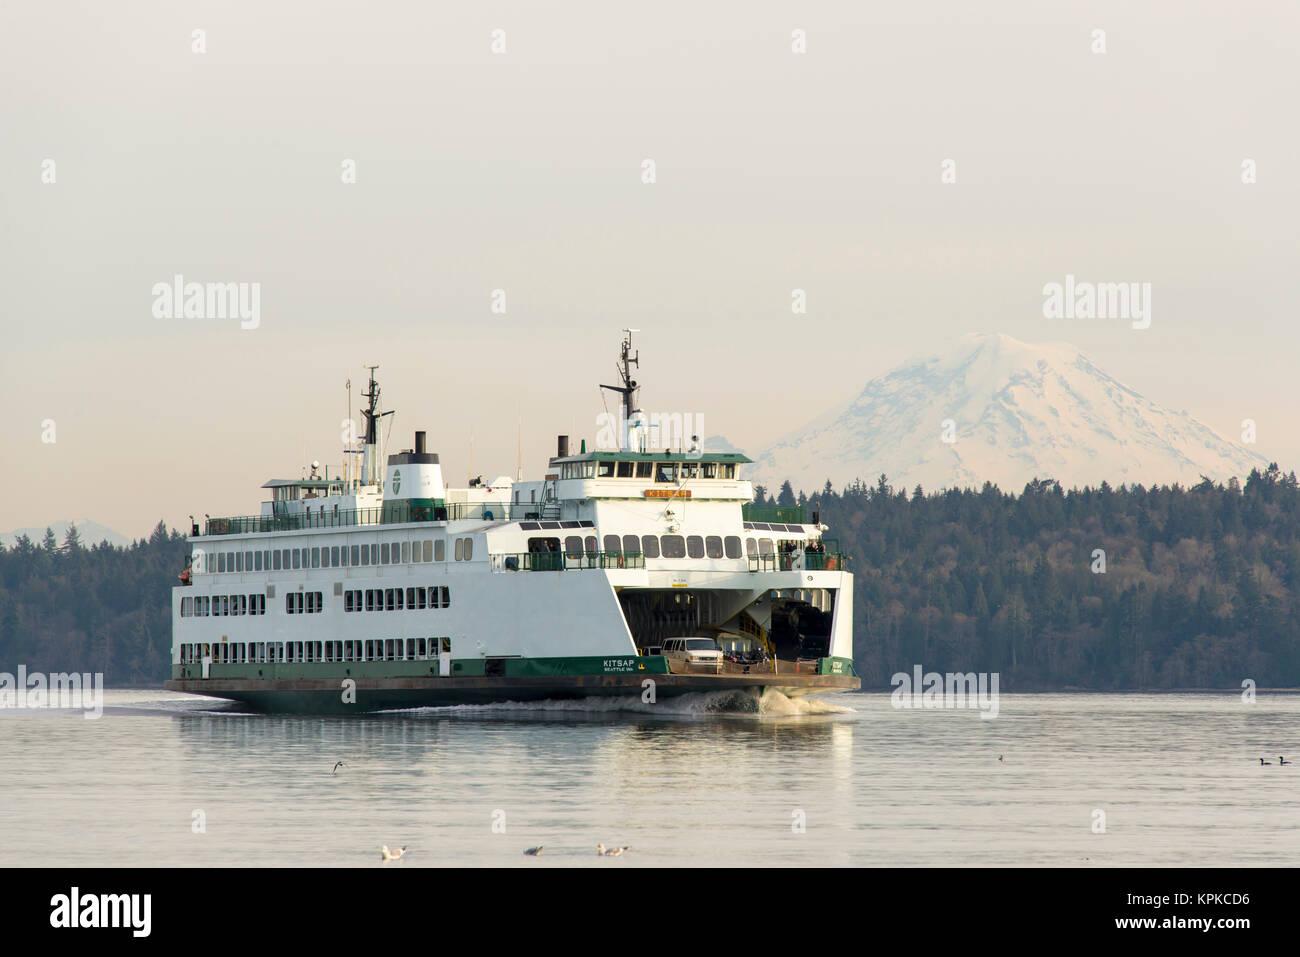 Ferry From Bremerton To Bainbridge Island